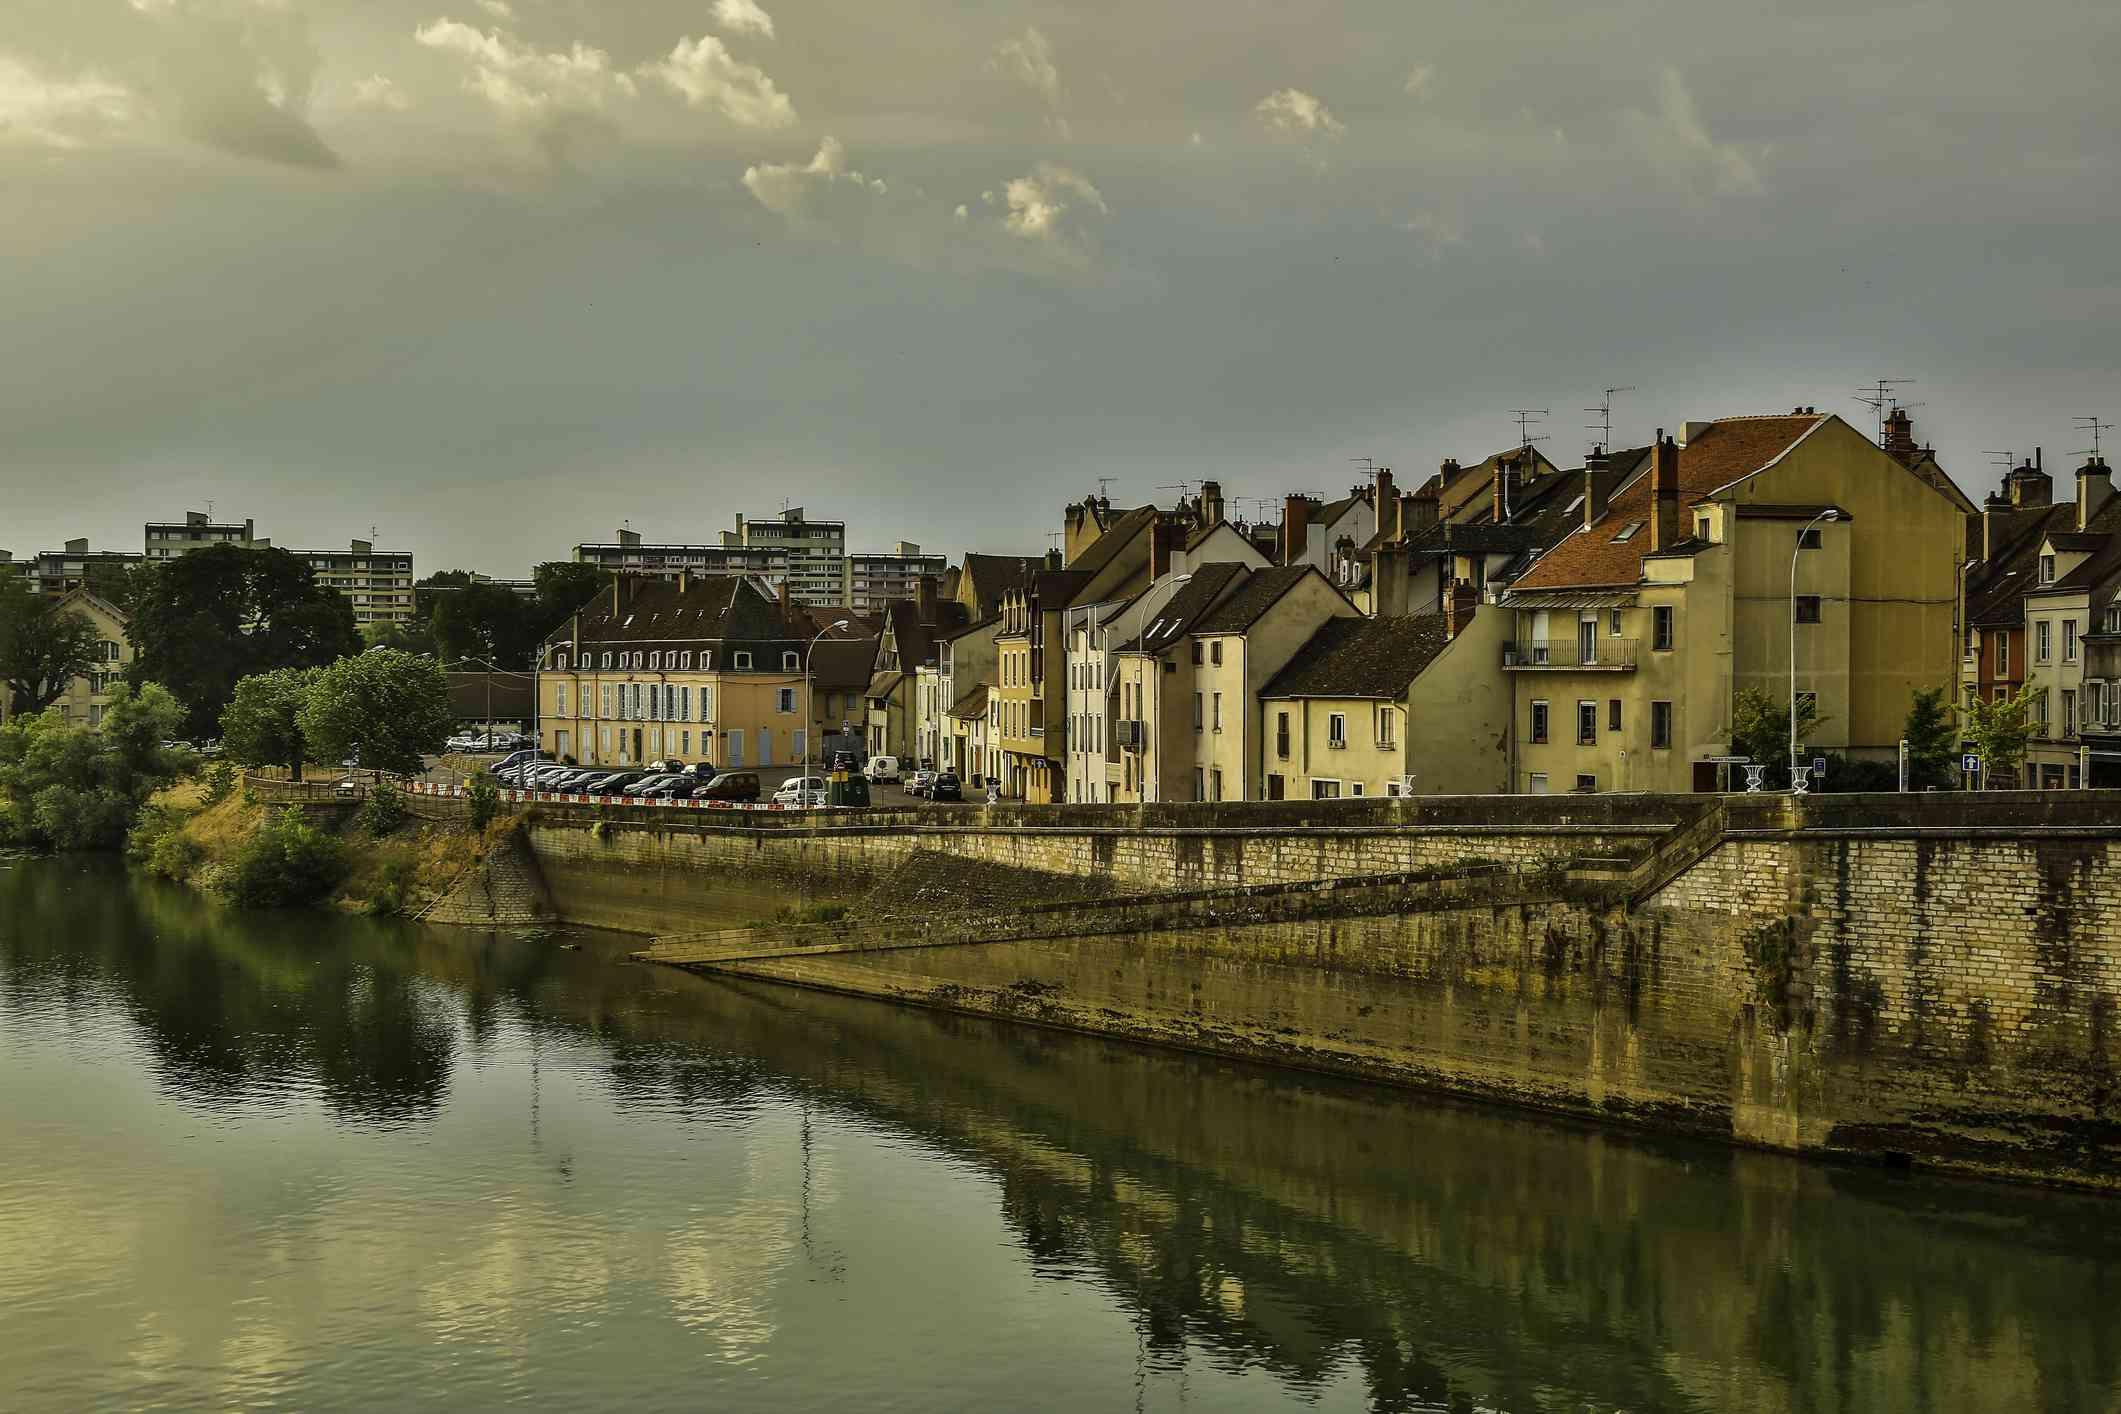 Chalon-sur-Saone, Burgundy, France